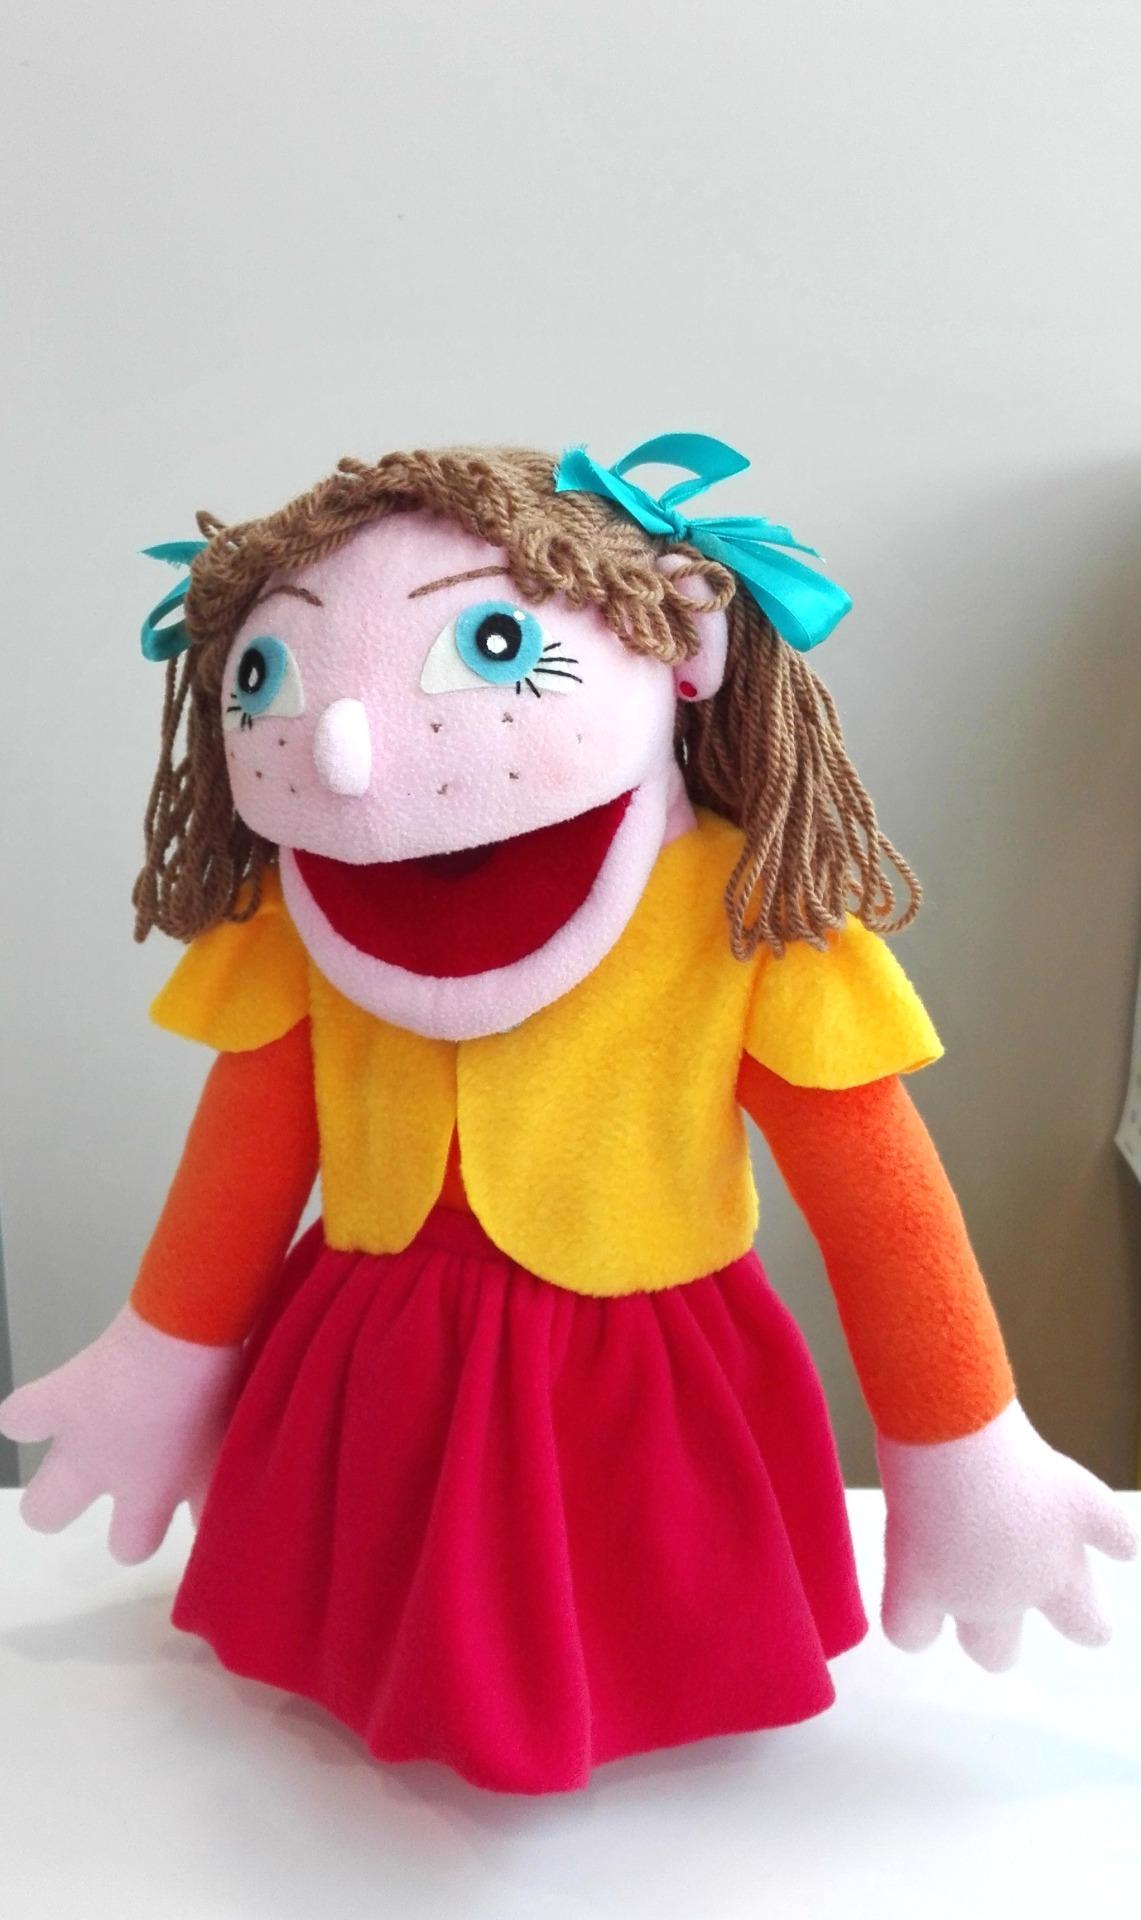 Кукла театральная Девочка